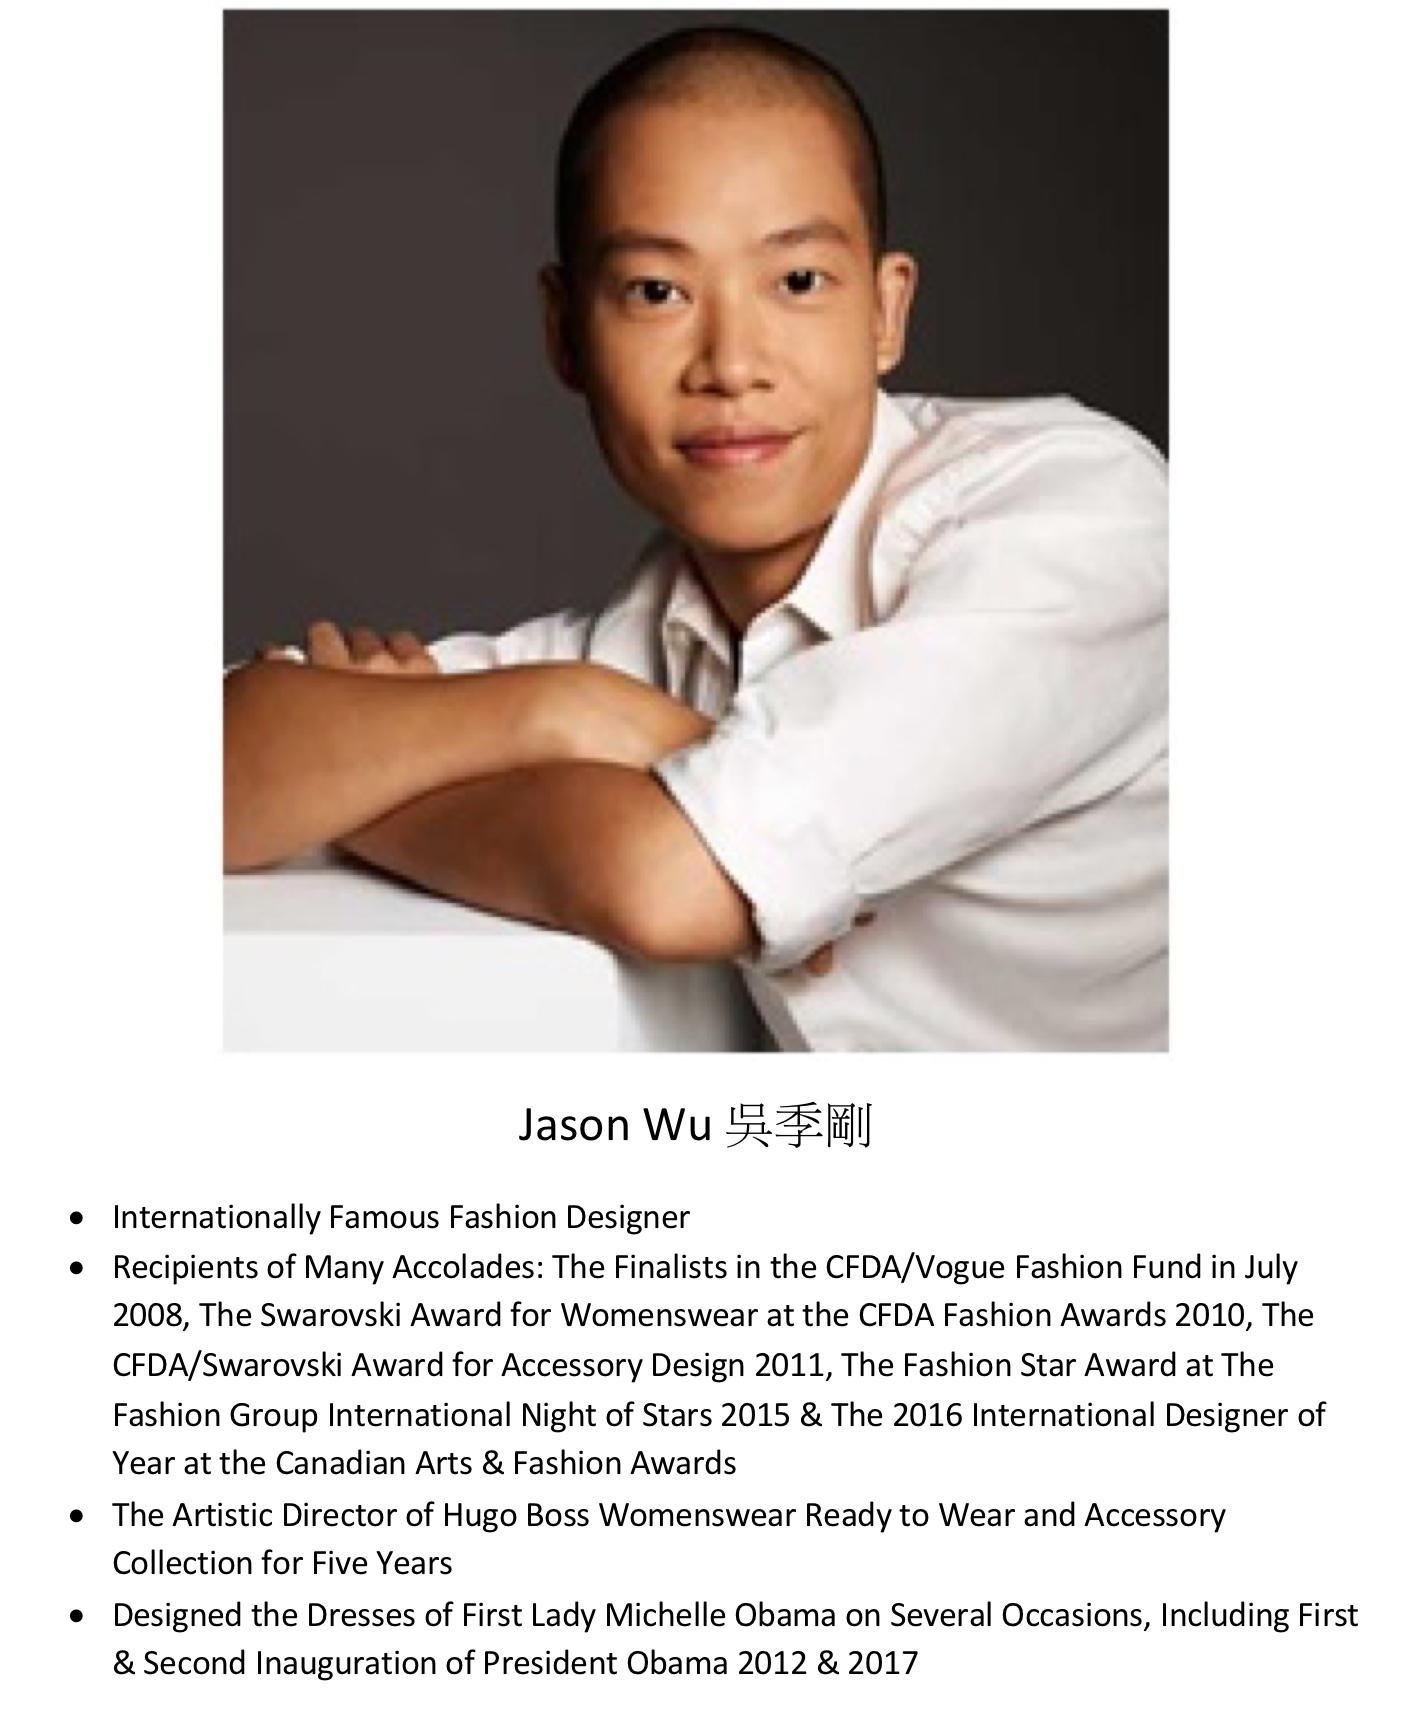 225. Jason Wu 吳季剛